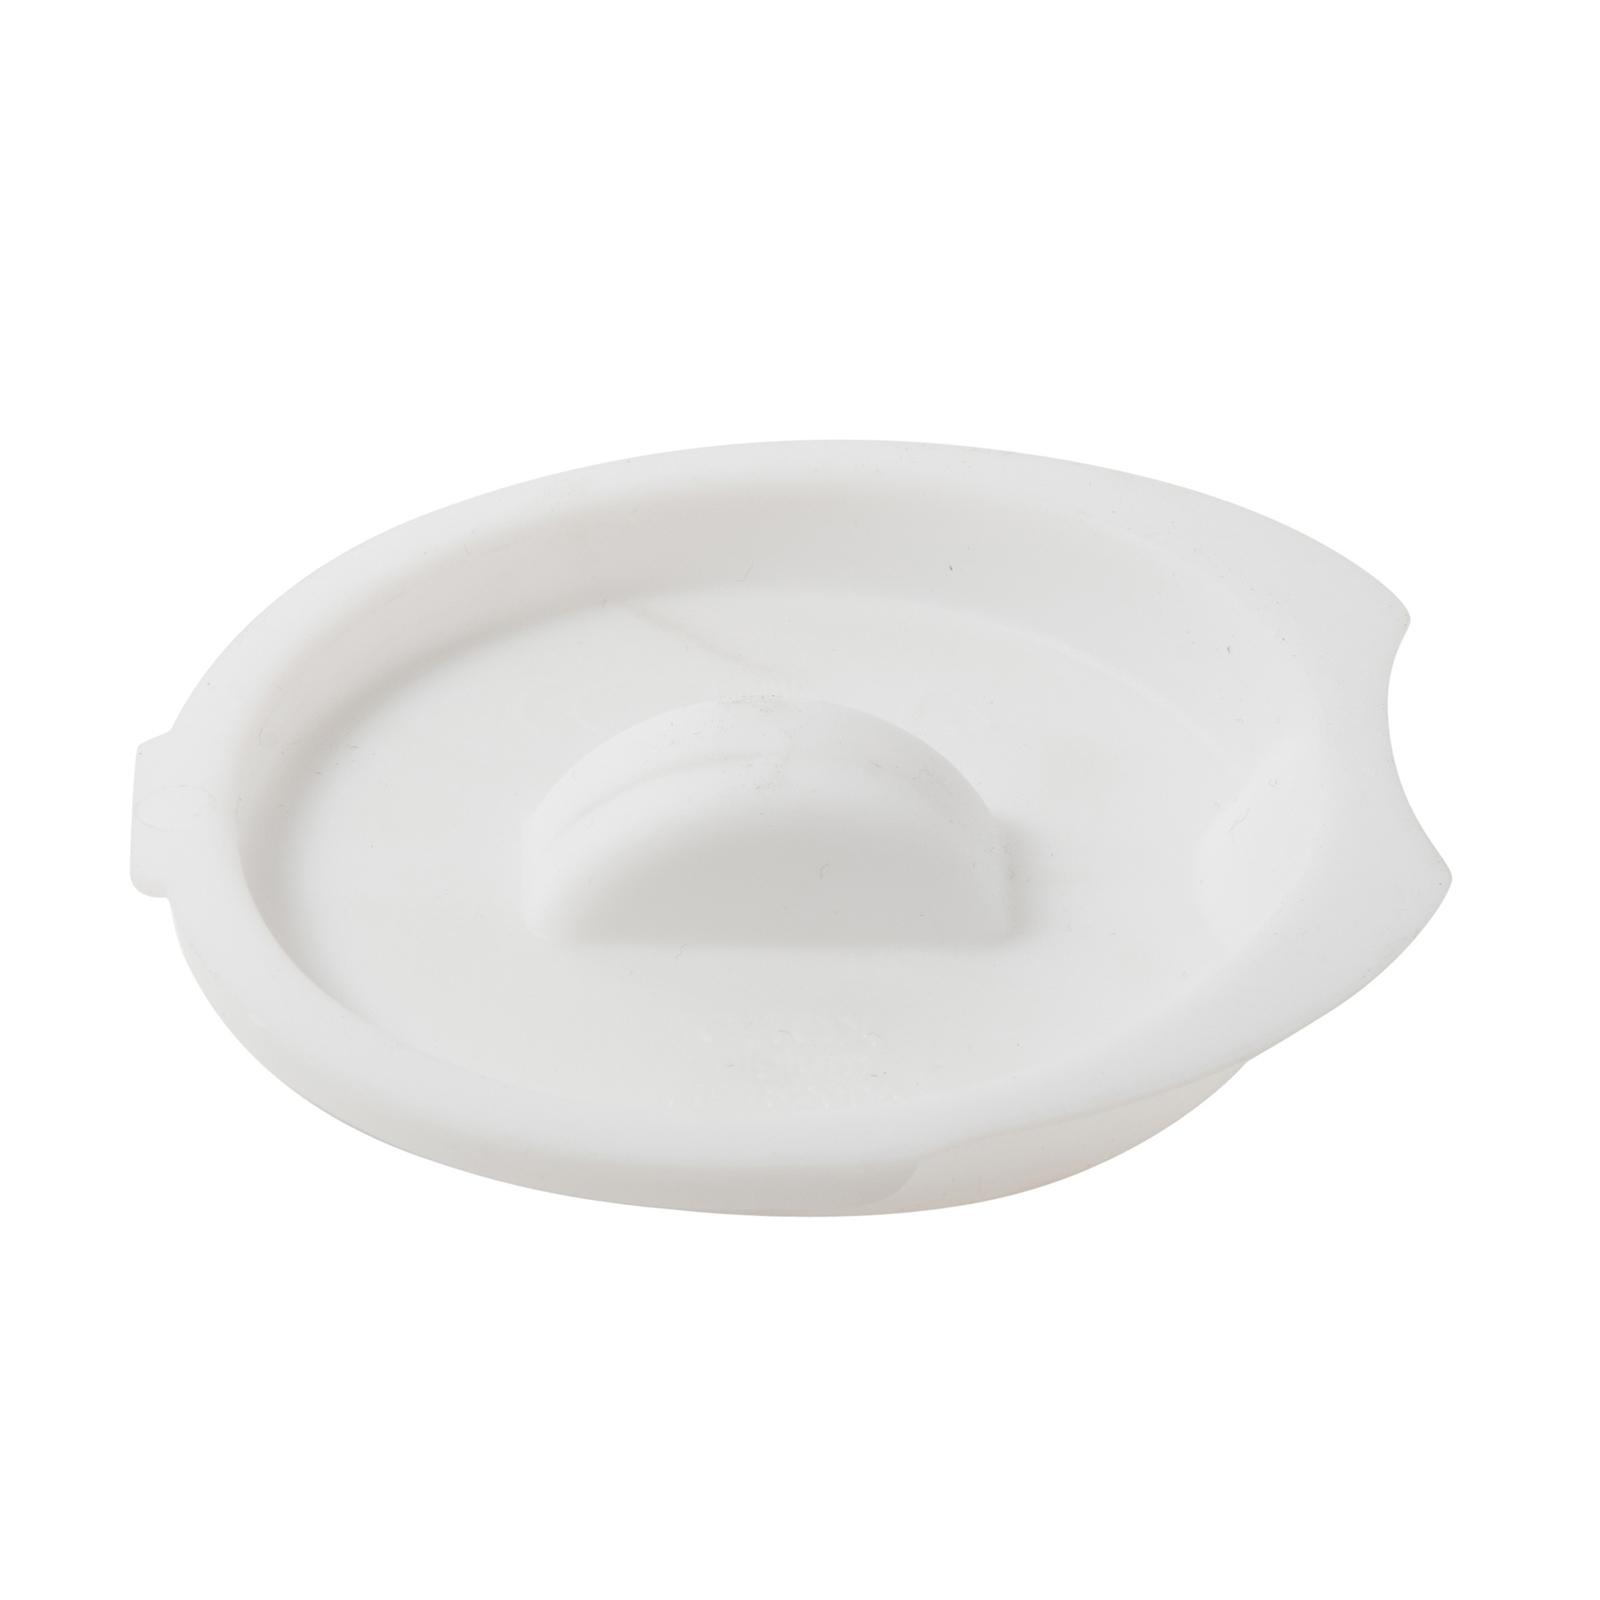 Mini Jug Lid - White